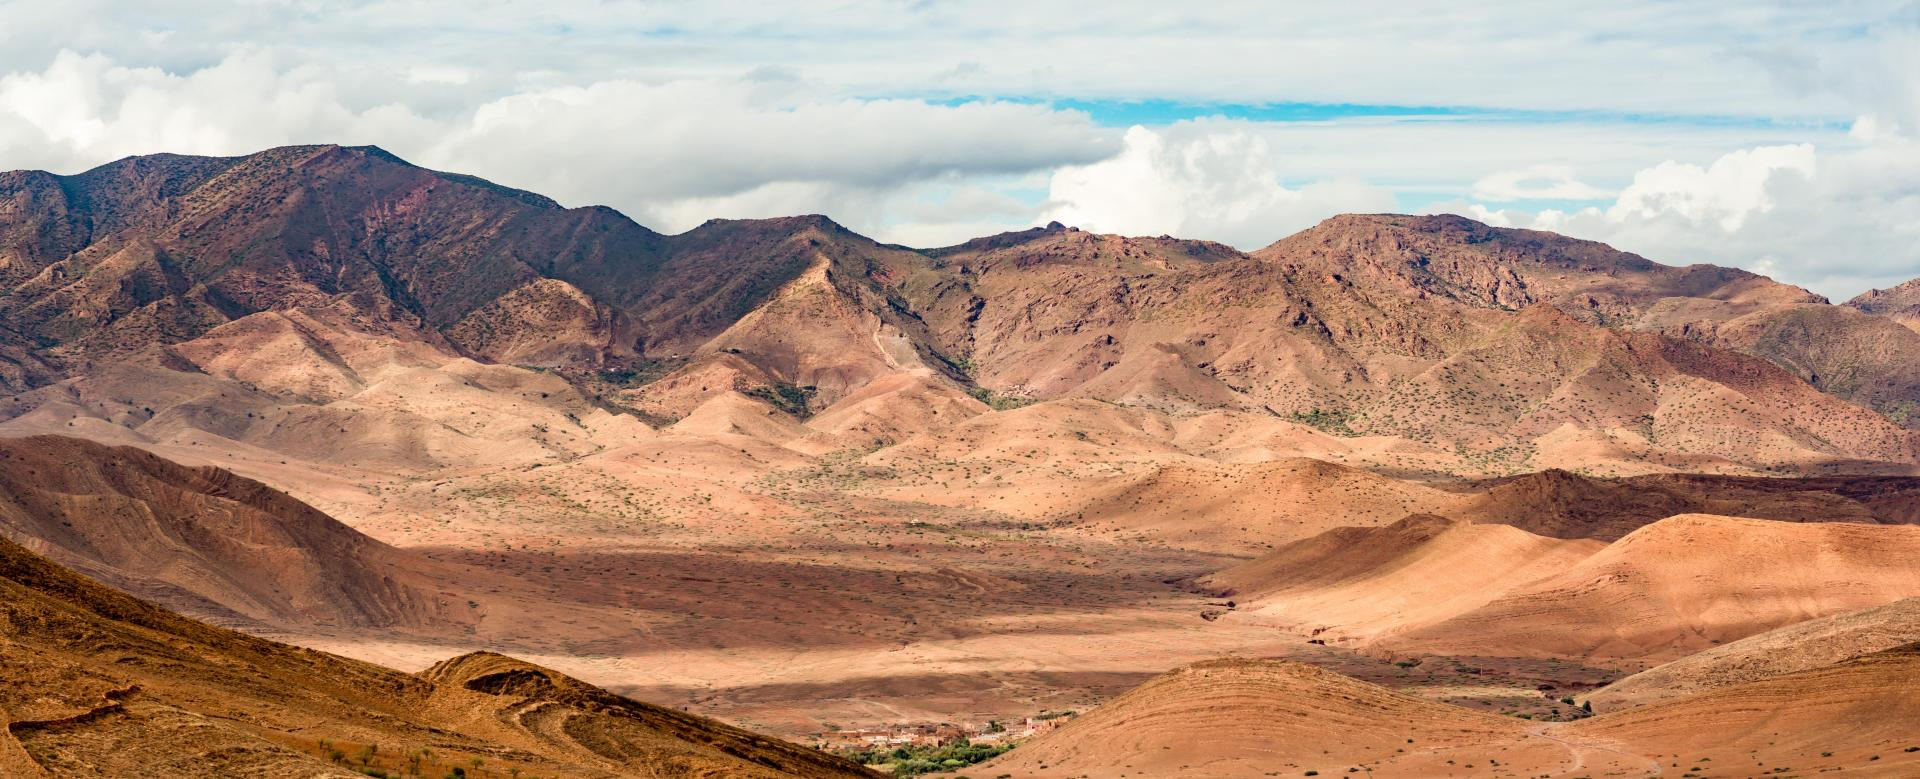 Voyage en véhicule Maroc : Kaléidoscope marocain